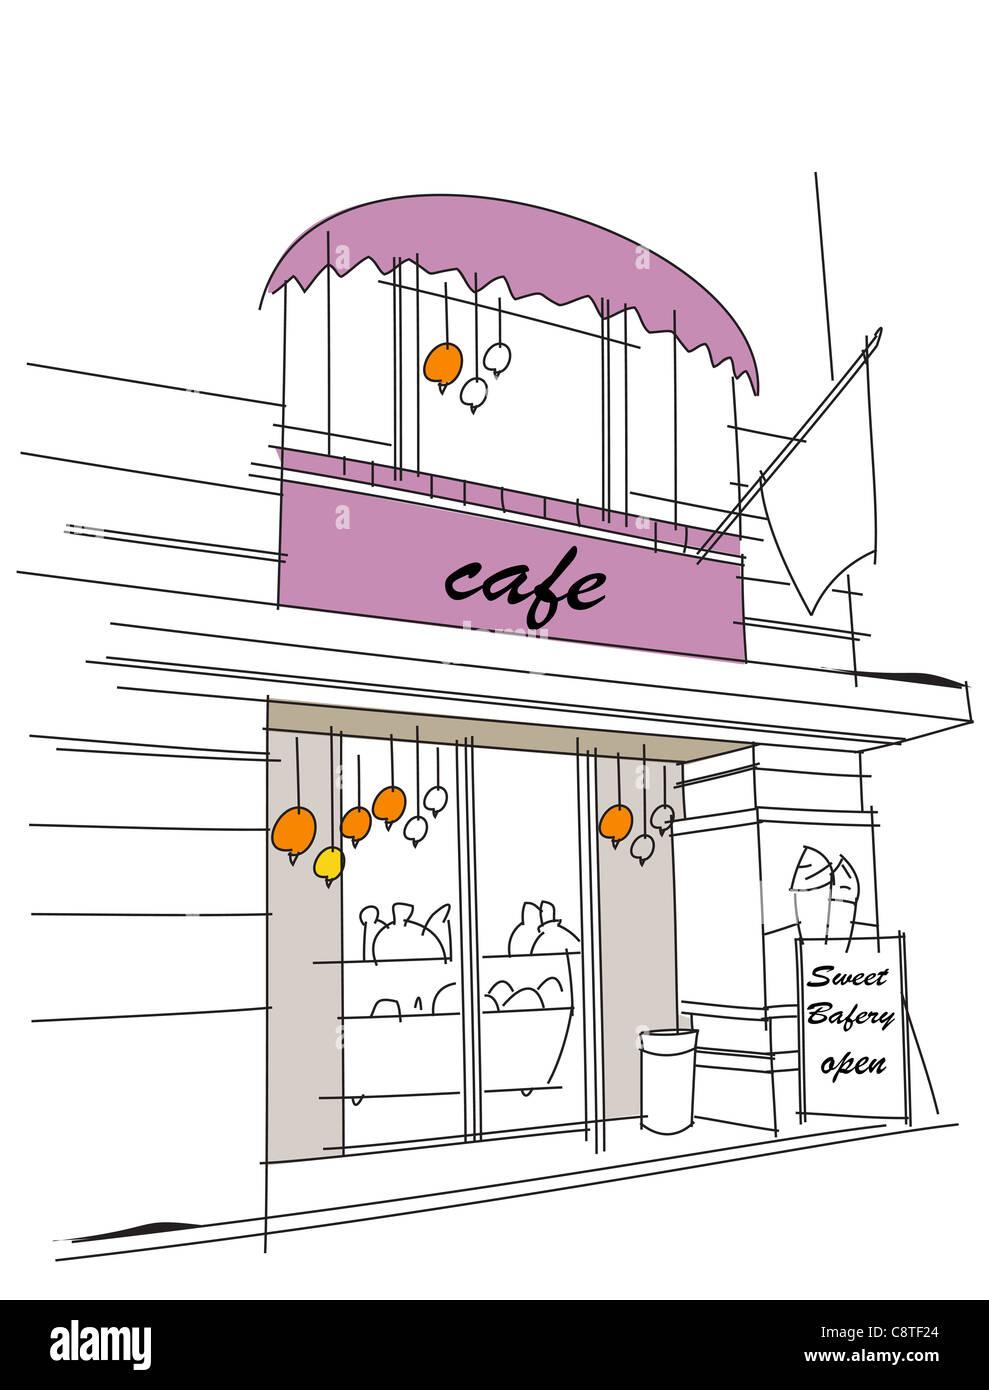 Cafe Exterior Stock Photo Alamy